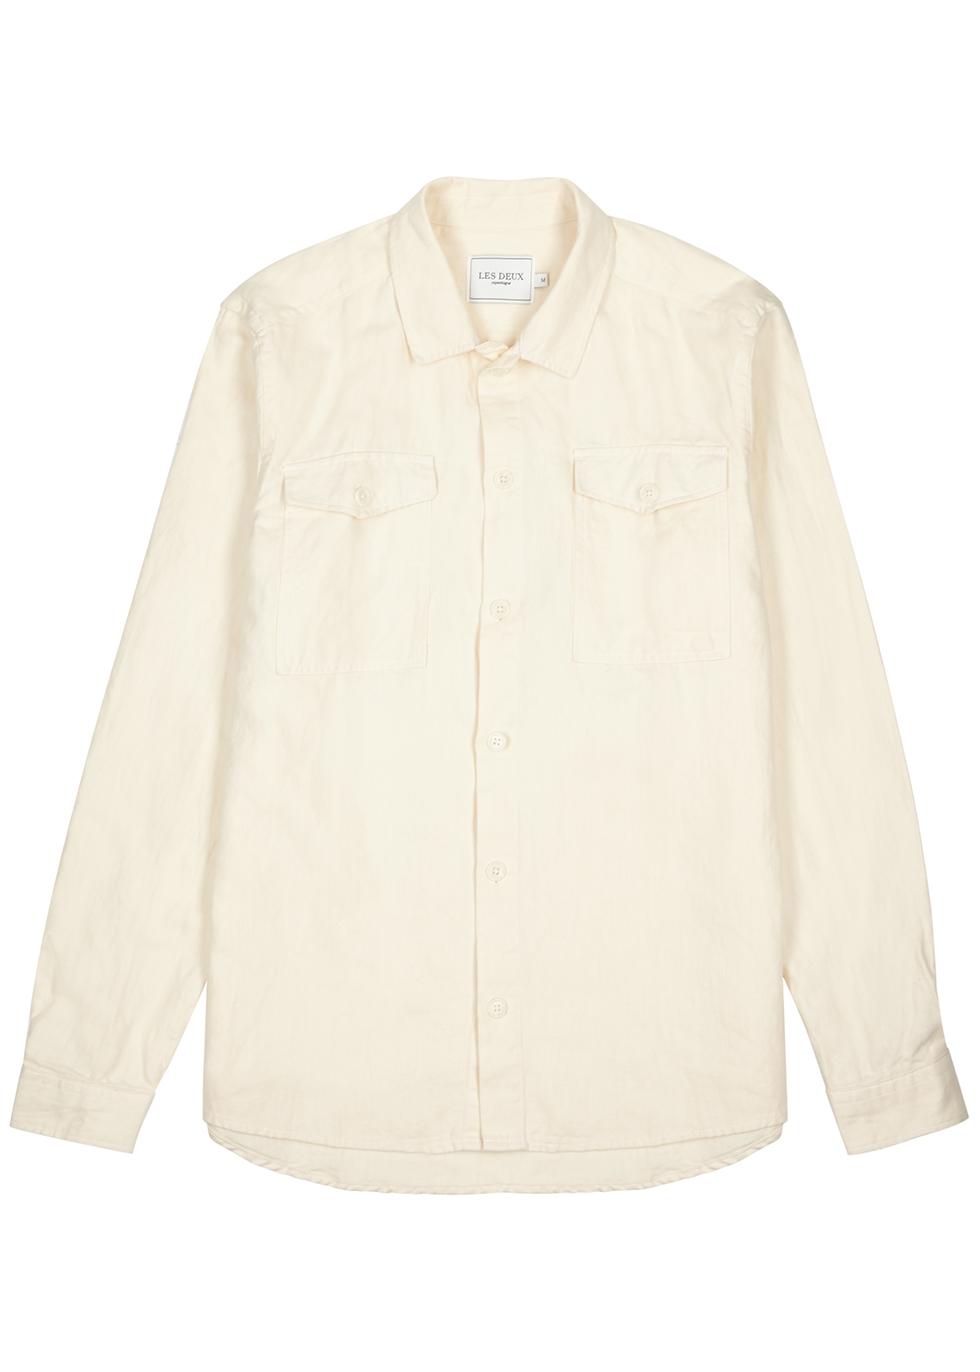 Liam ecru cotton-twill shirt